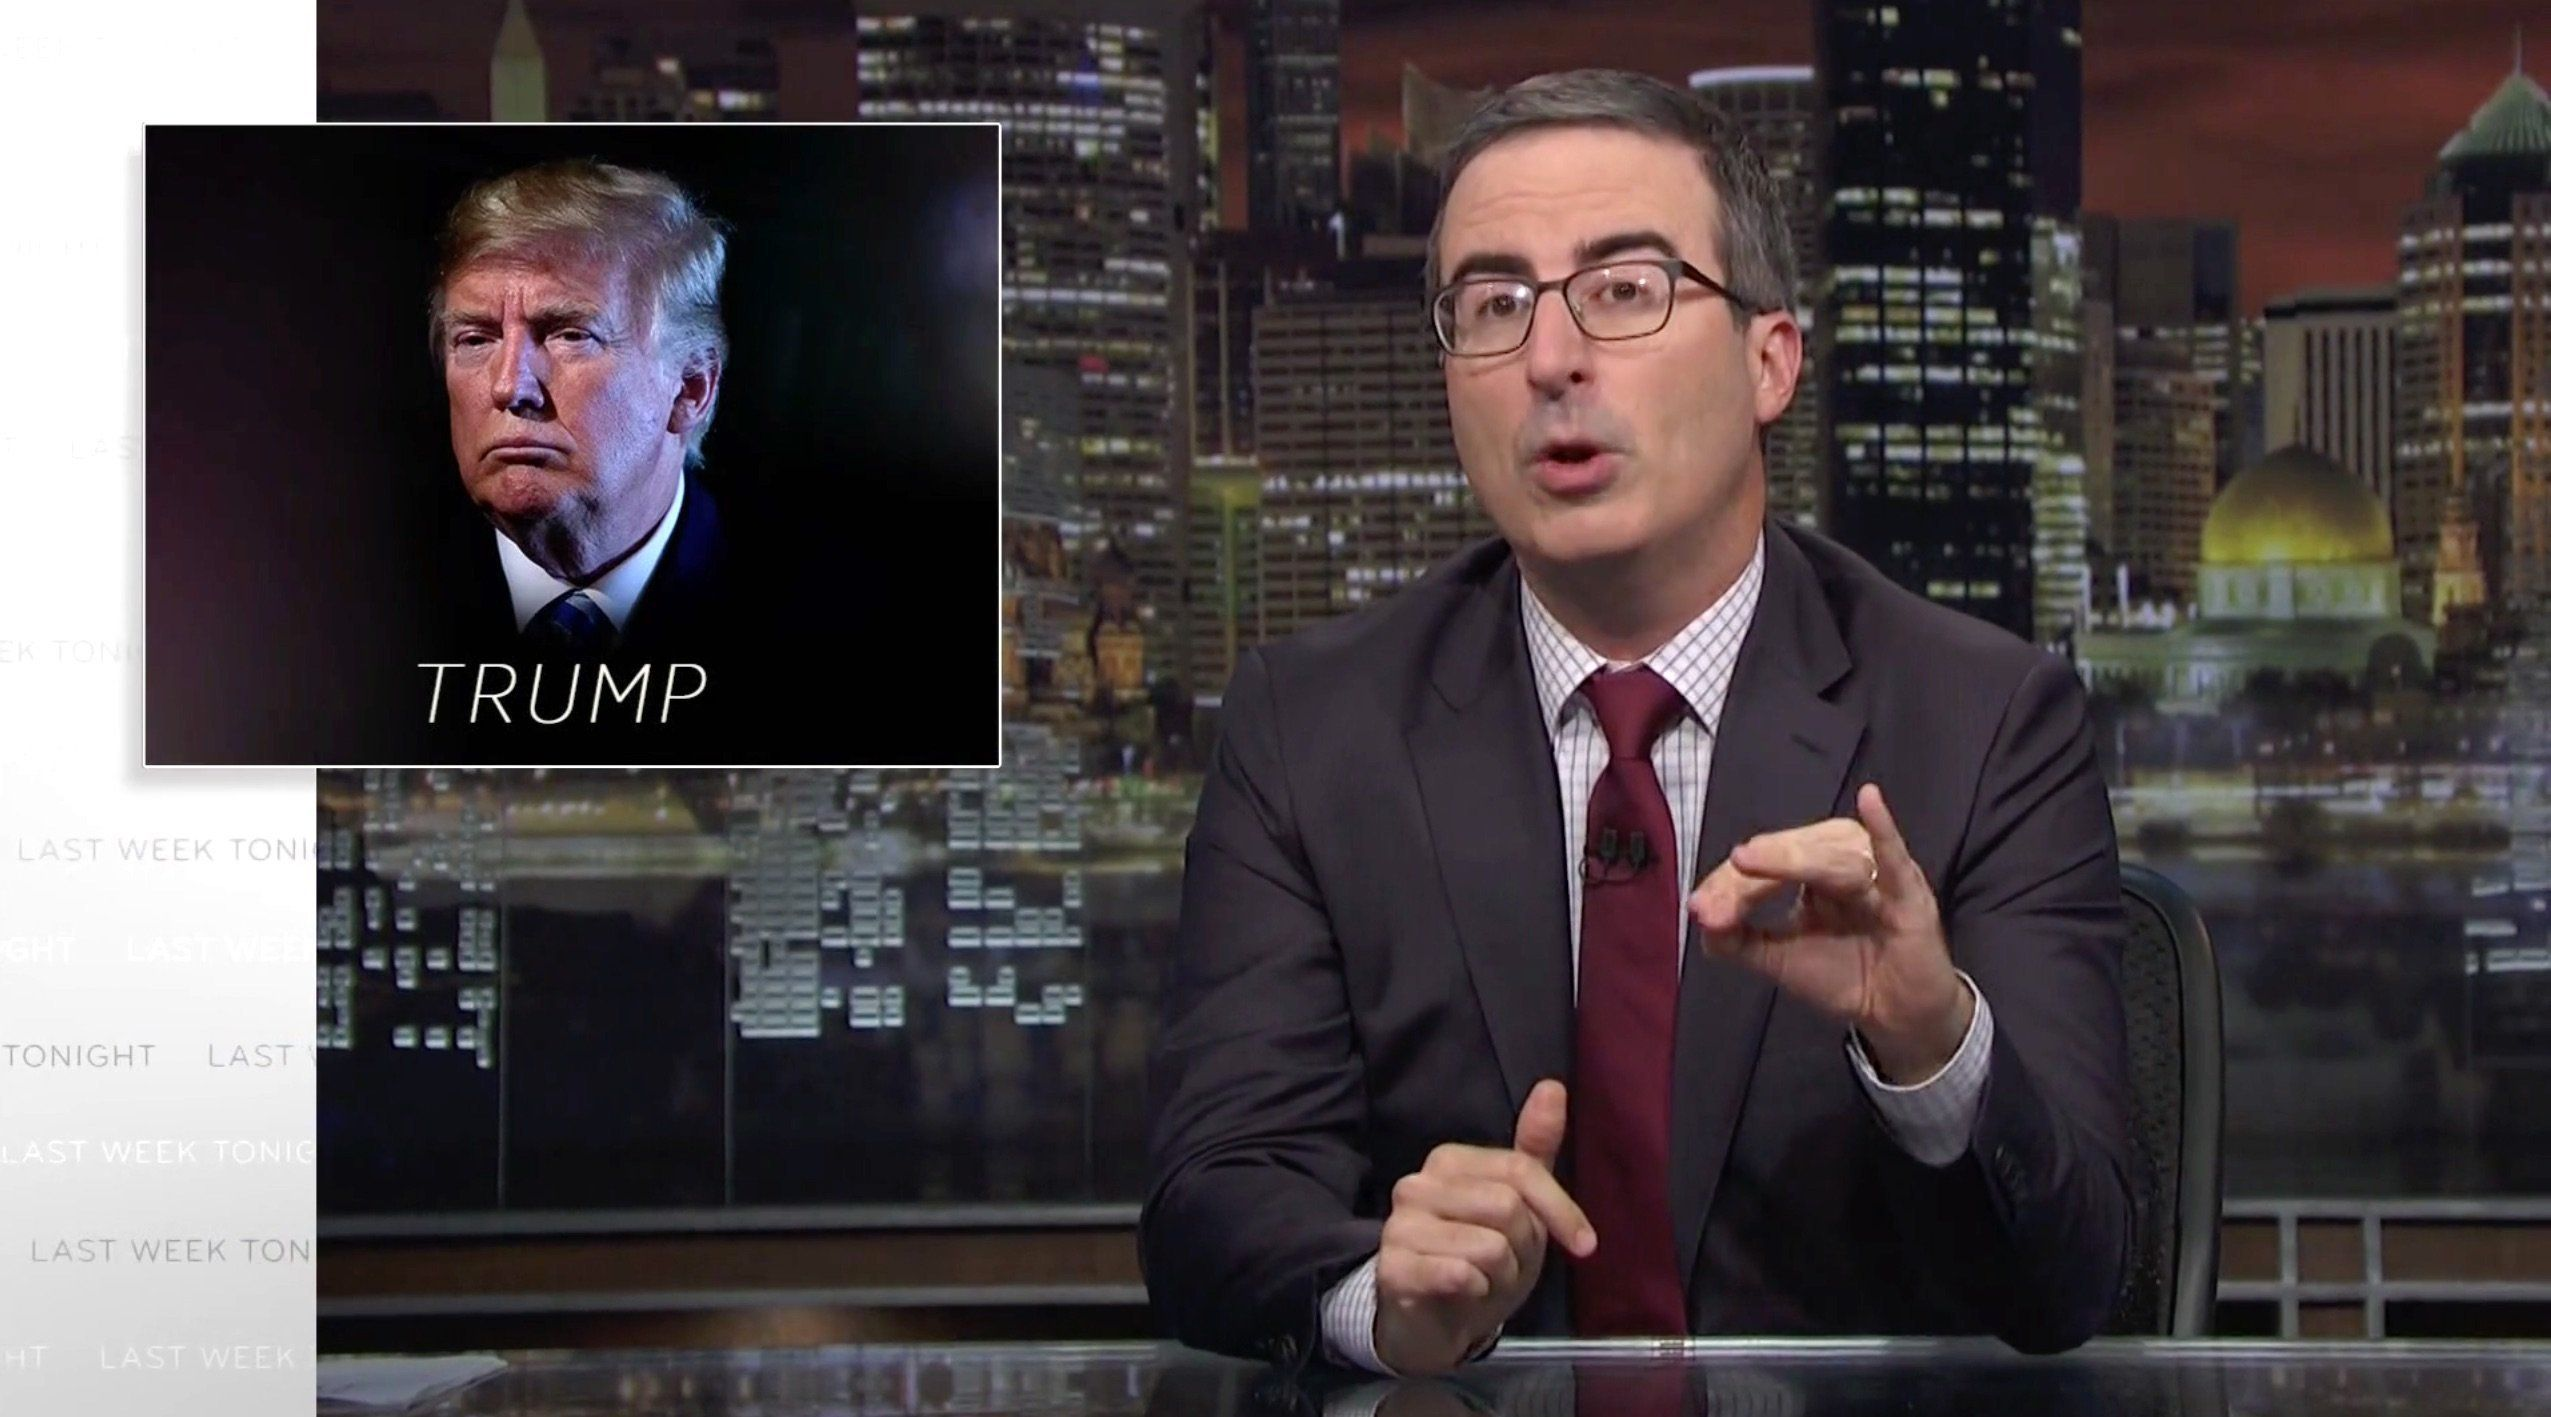 John Oliver Hits 'Sh*thead' Trump For Attacks On Kavanaugh